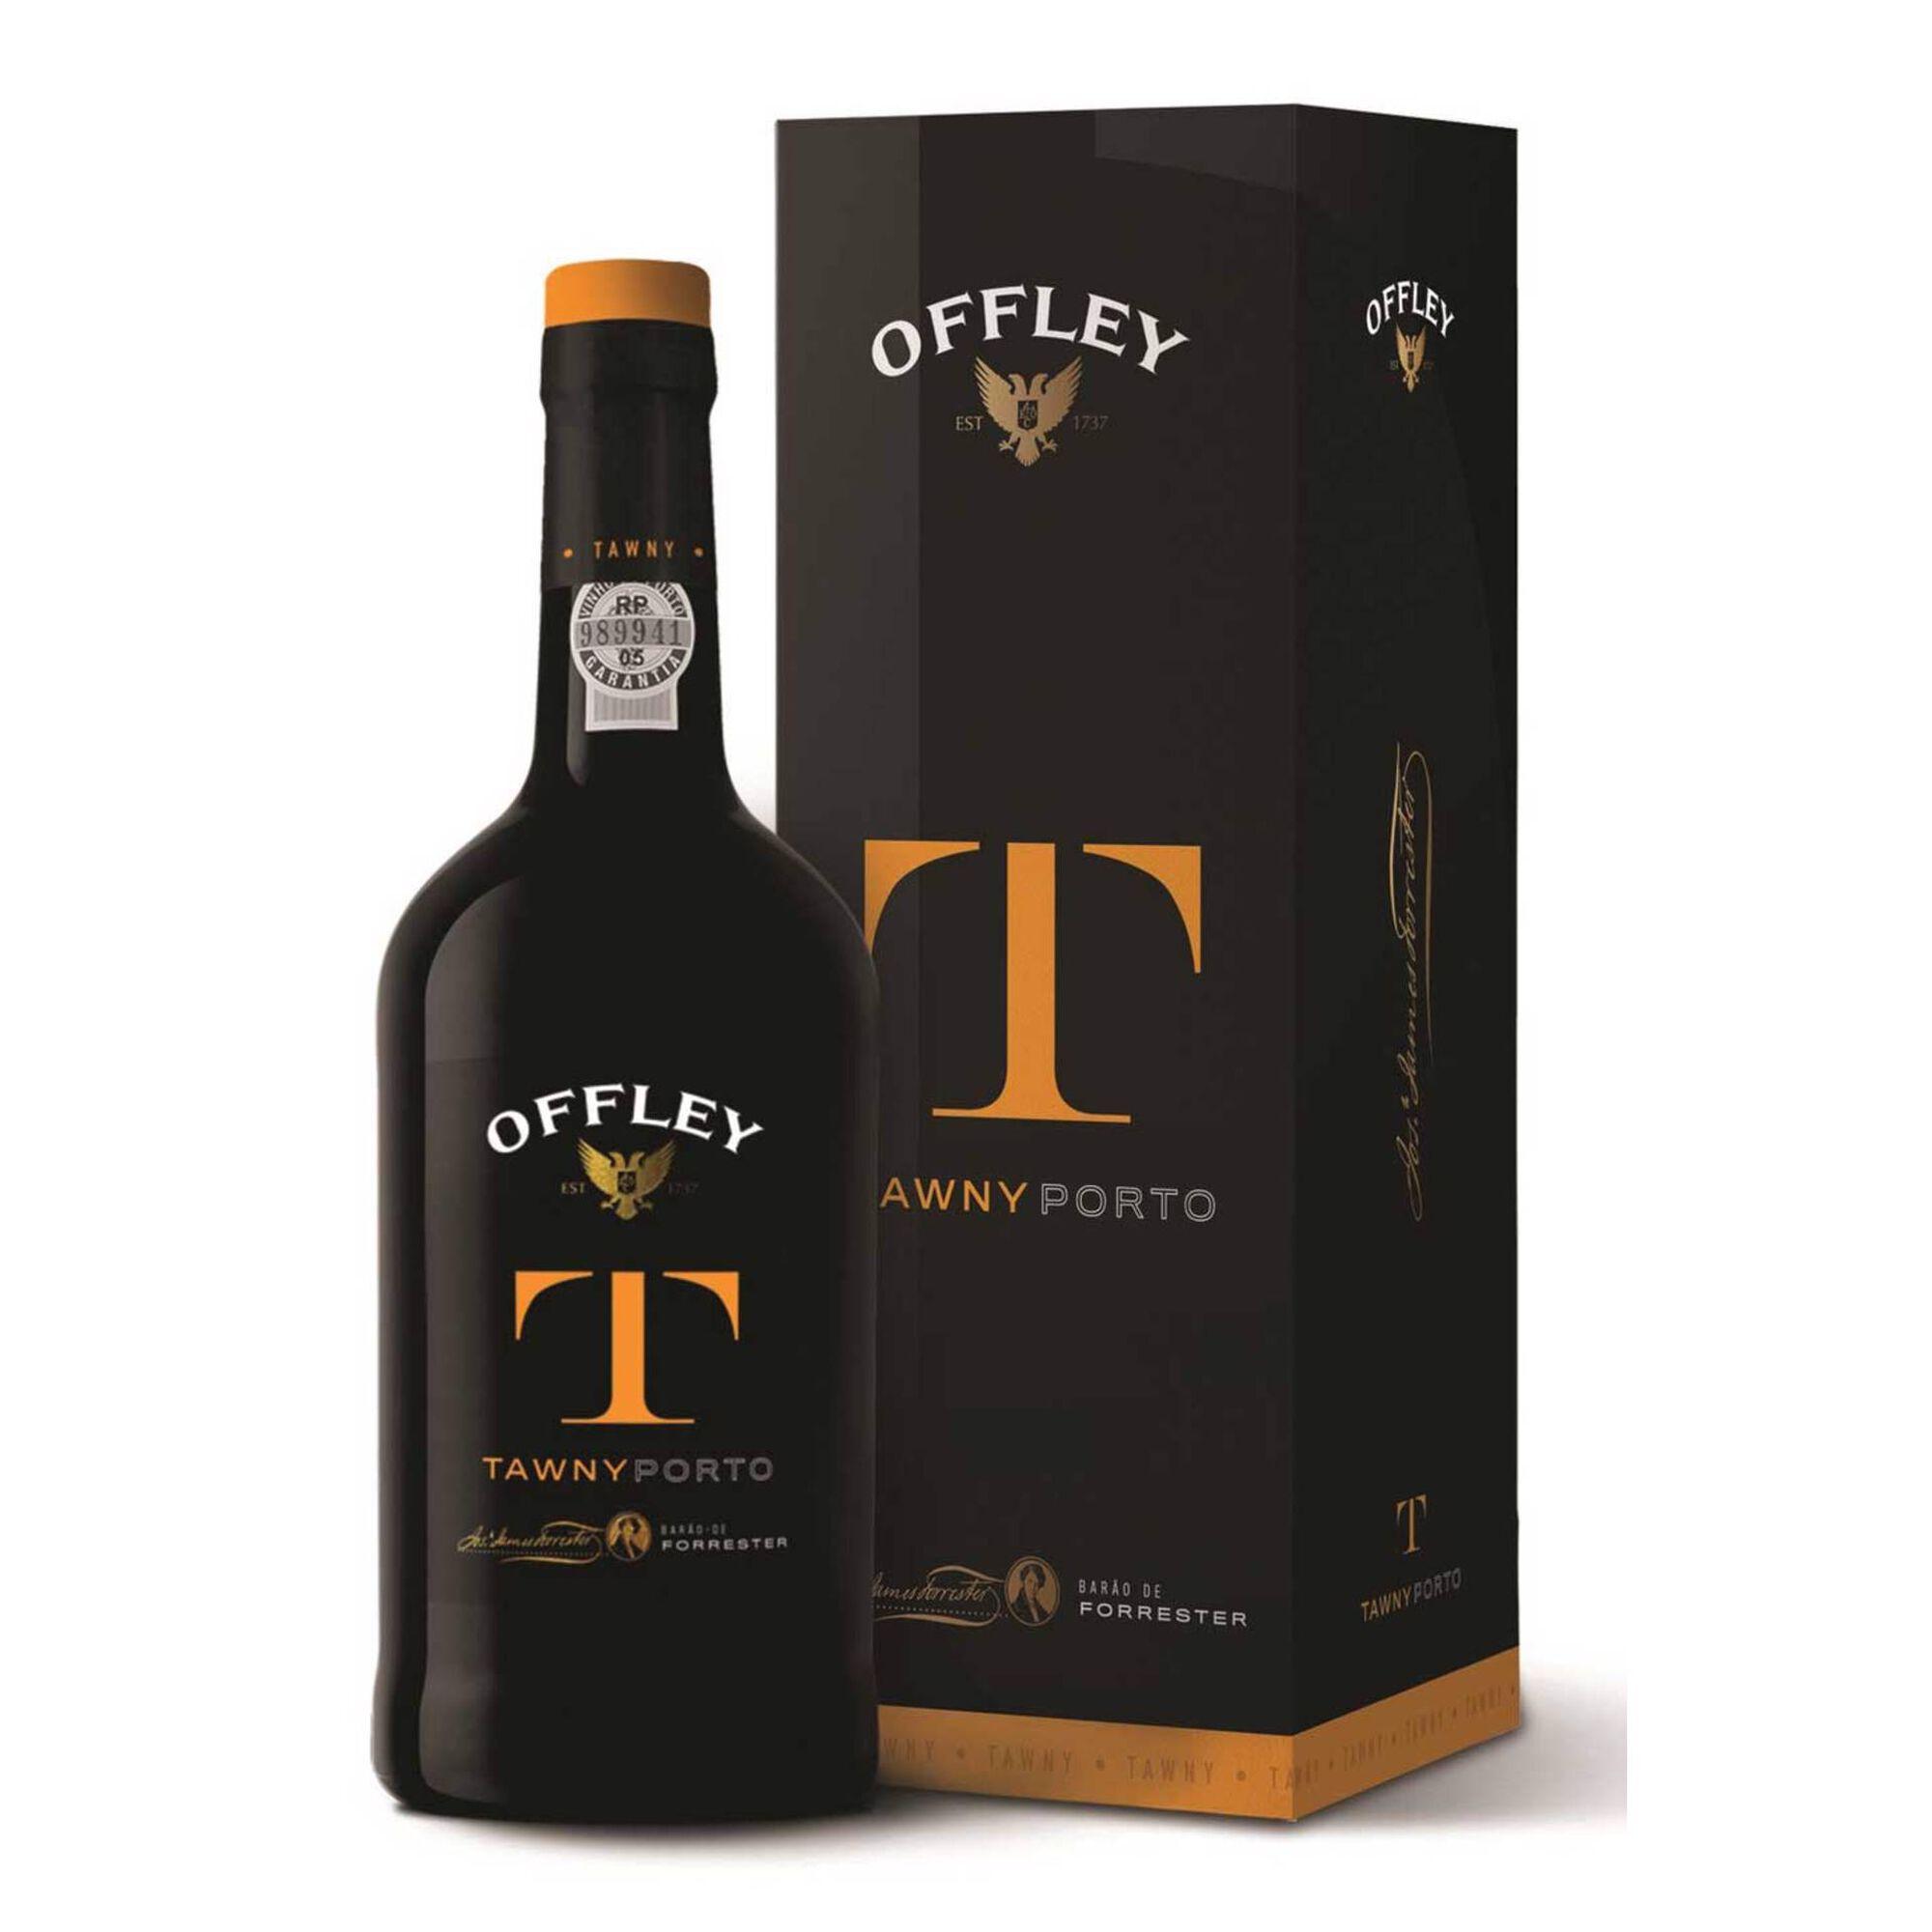 Offley Vinho do Porto Tawny